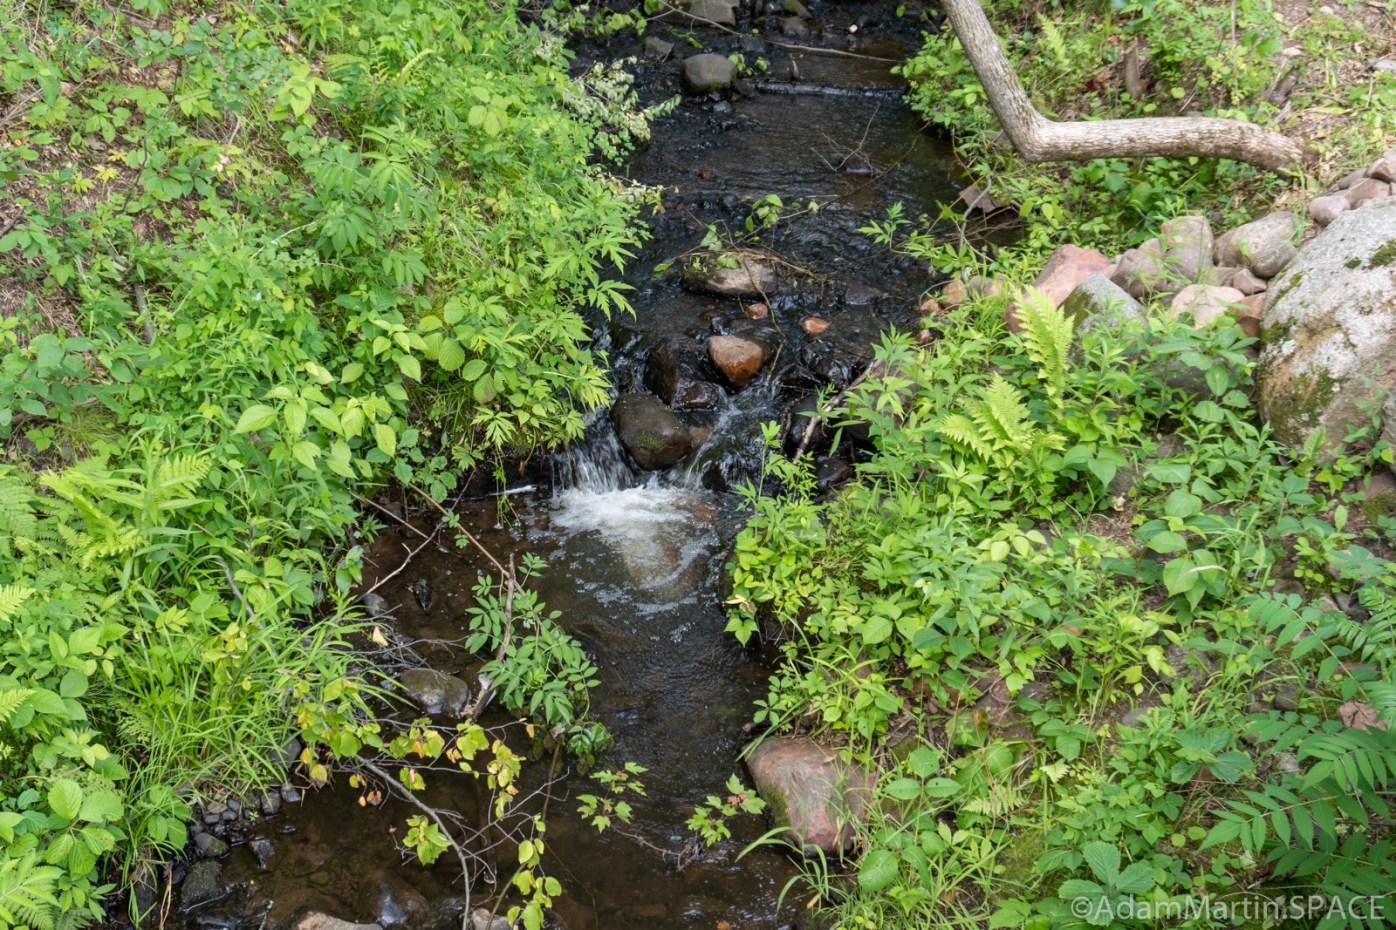 Lake Wissota Rapids - Tiny falls off the trailside